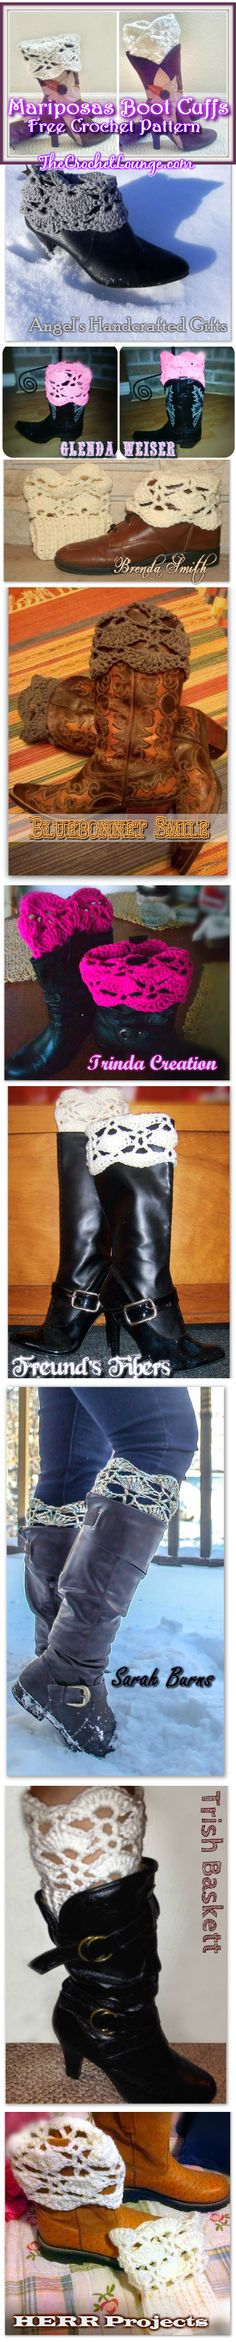 #Crochet Mariposas Boot Cuffs by The Crochet Lounge™   Crochet Free Pattern: http://thecrochetlounge.com/mariposas-boot-cuffs-free-crochet-pattern/  Ravelry Link at bottom of pattern. #TheCrochetLounge #FreePattern  Photo Contributions by: Angel's Handcrafted Gifts, Glenda Weiser, Brenda Smith, Bluebonnet Smile, Trinda Creation, Freund's Fibers, Sarah Burns, Trish Baskett, and HERR Projects